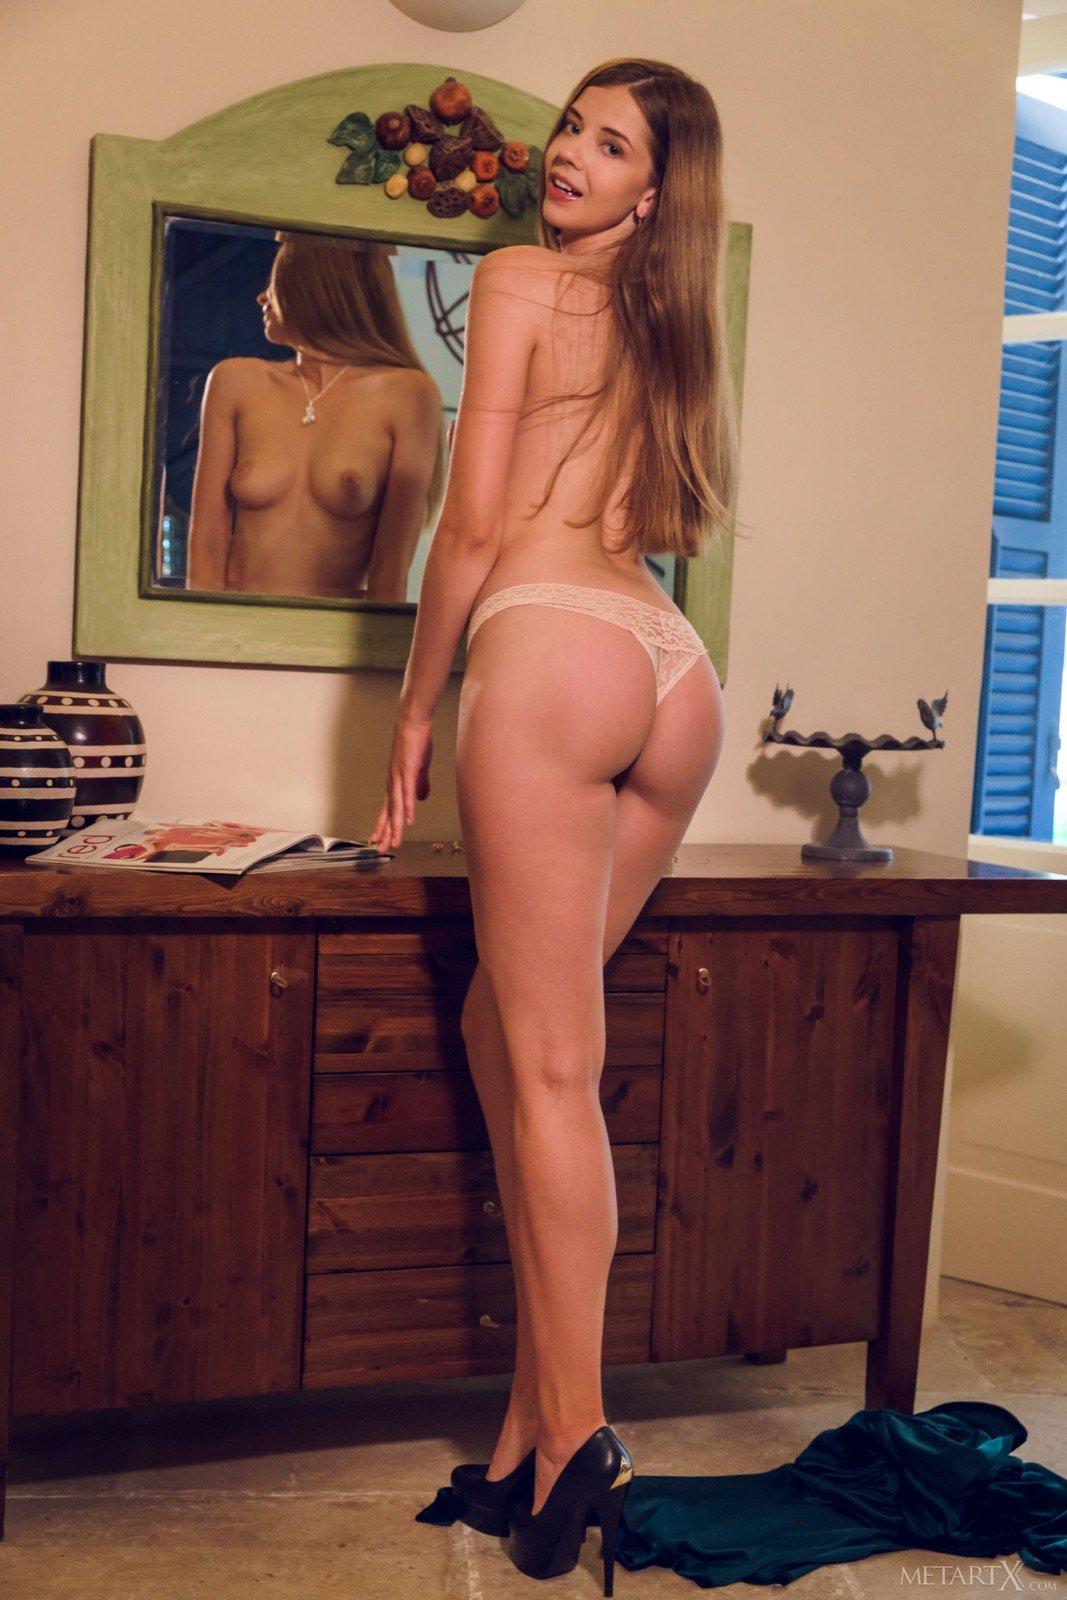 Брюнетка в бикини и халате обнажилась у зеркала